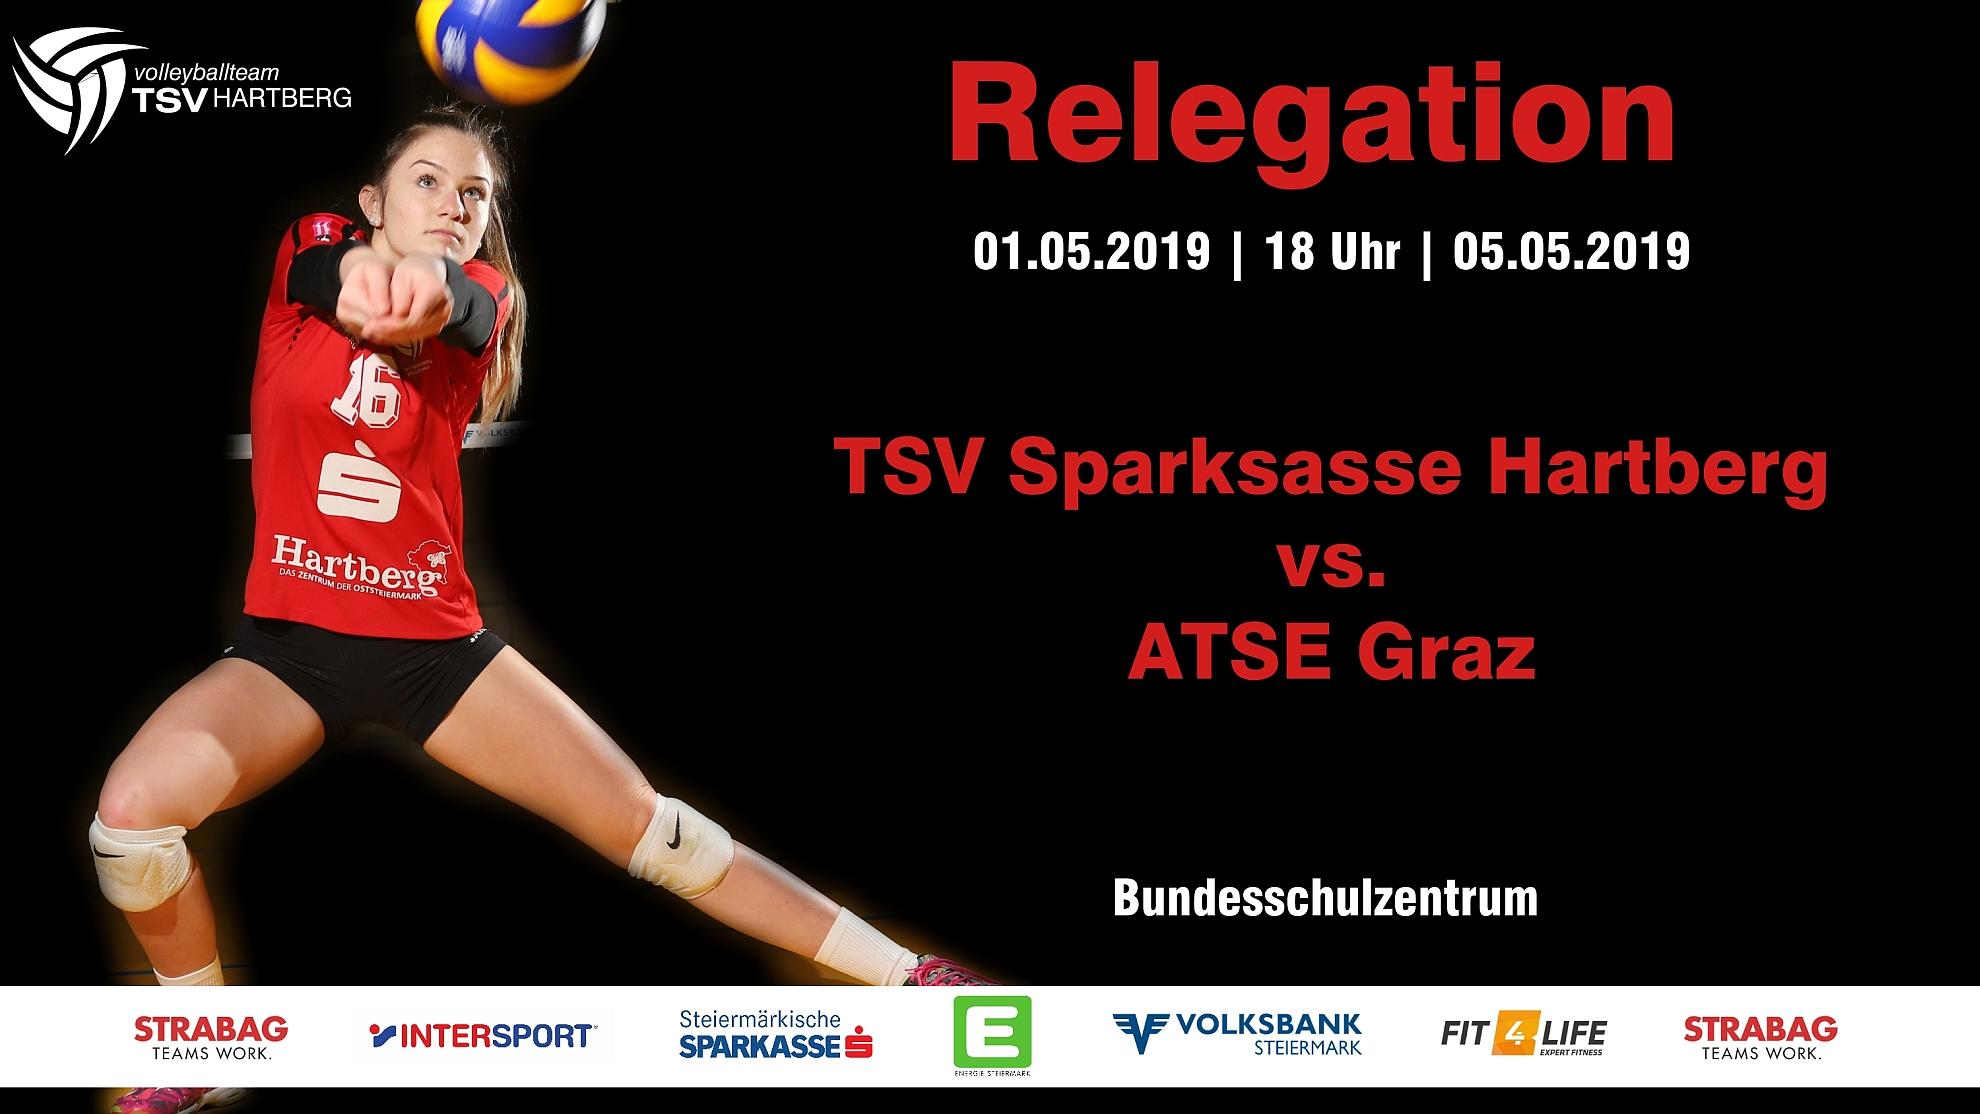 FOTO © TSV Hartberg